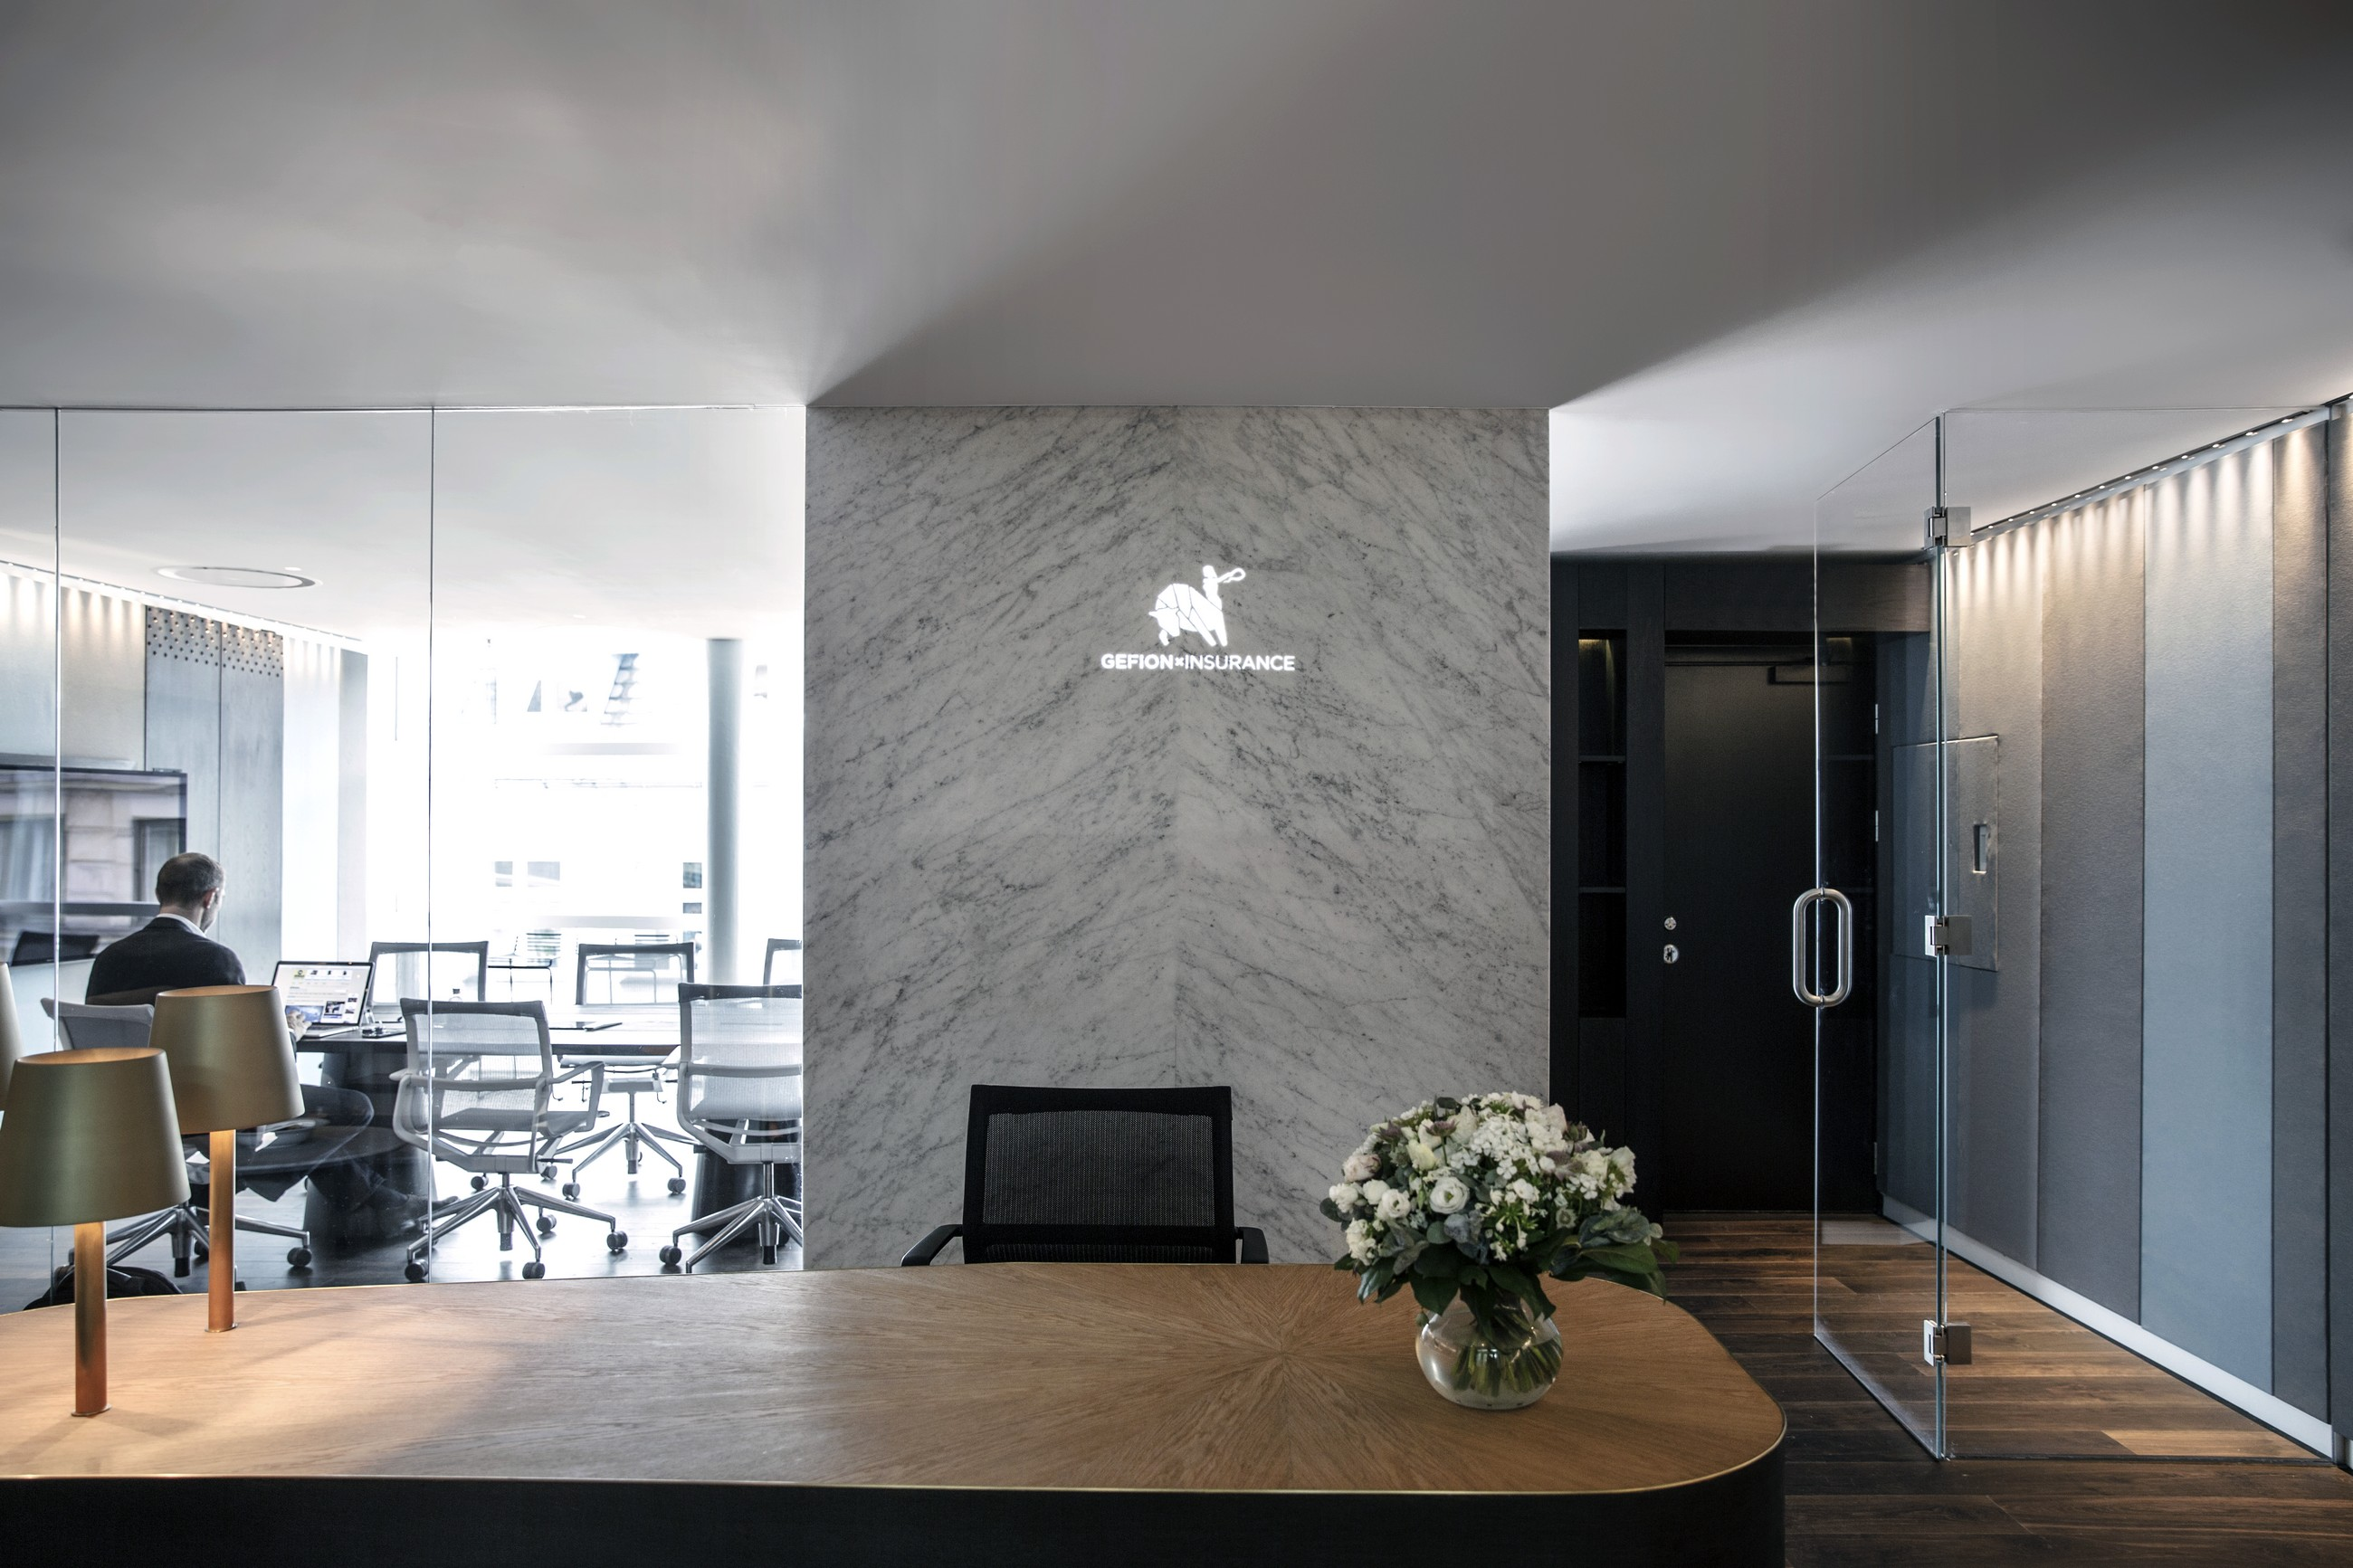 Gefion Insurance Headquarters Johannes Torpe Studios Archello